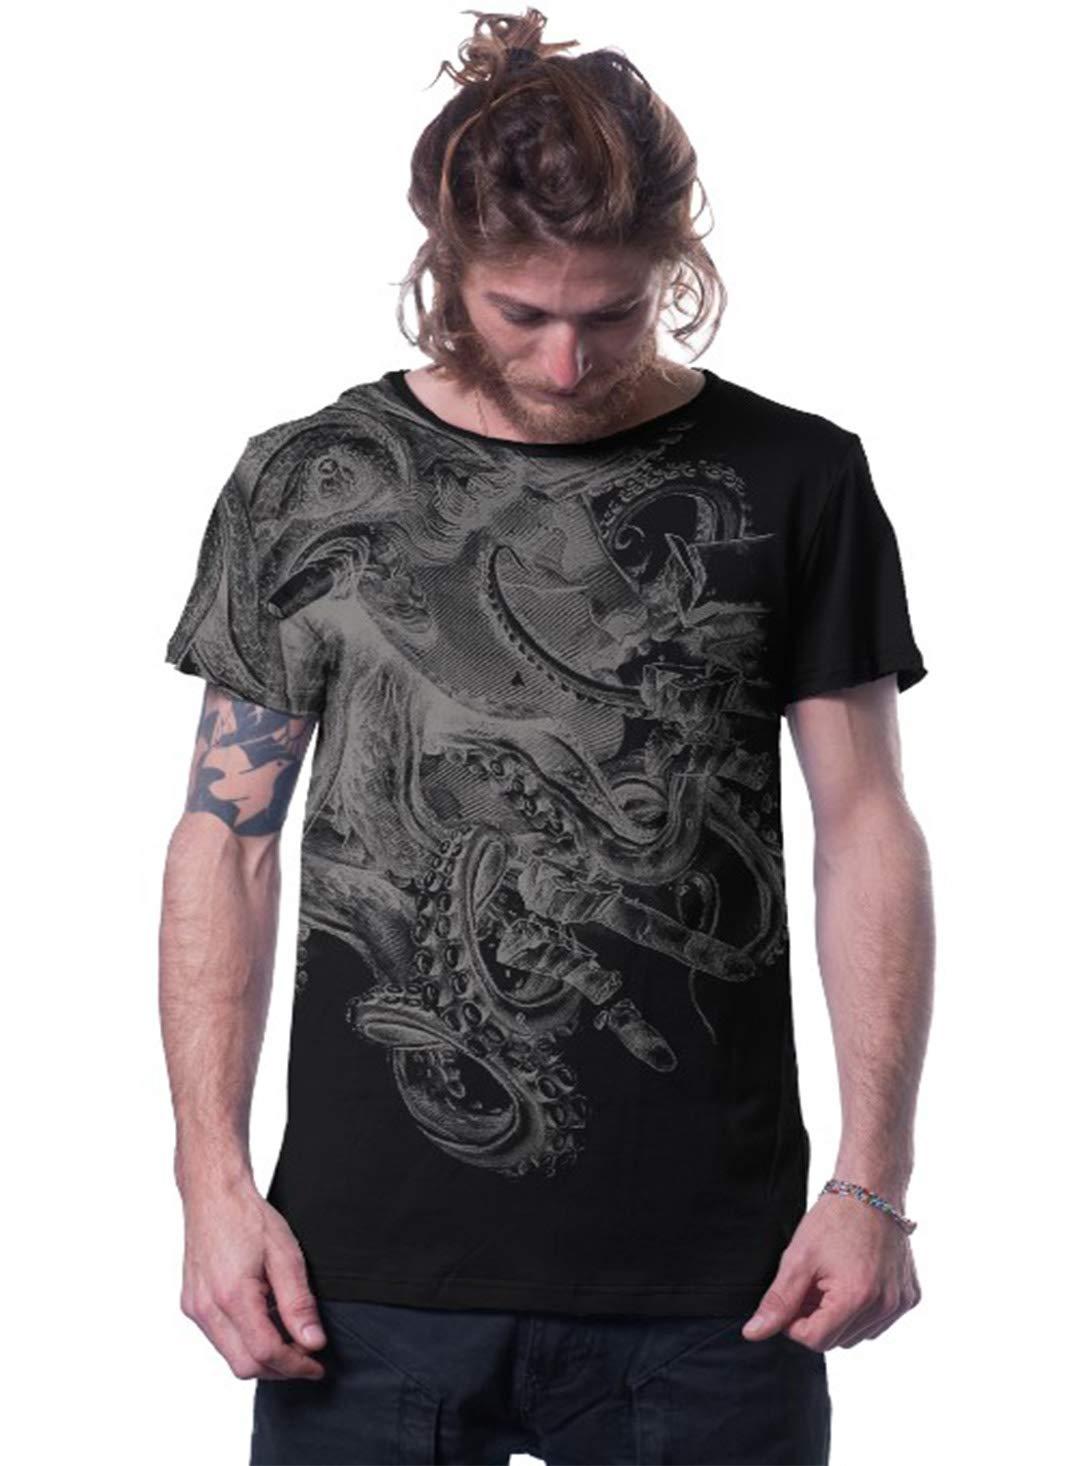 Men's David vs Kraken Octopus Cotton Jersey T-Shirt Mythical Battle Graphic Print Black Top